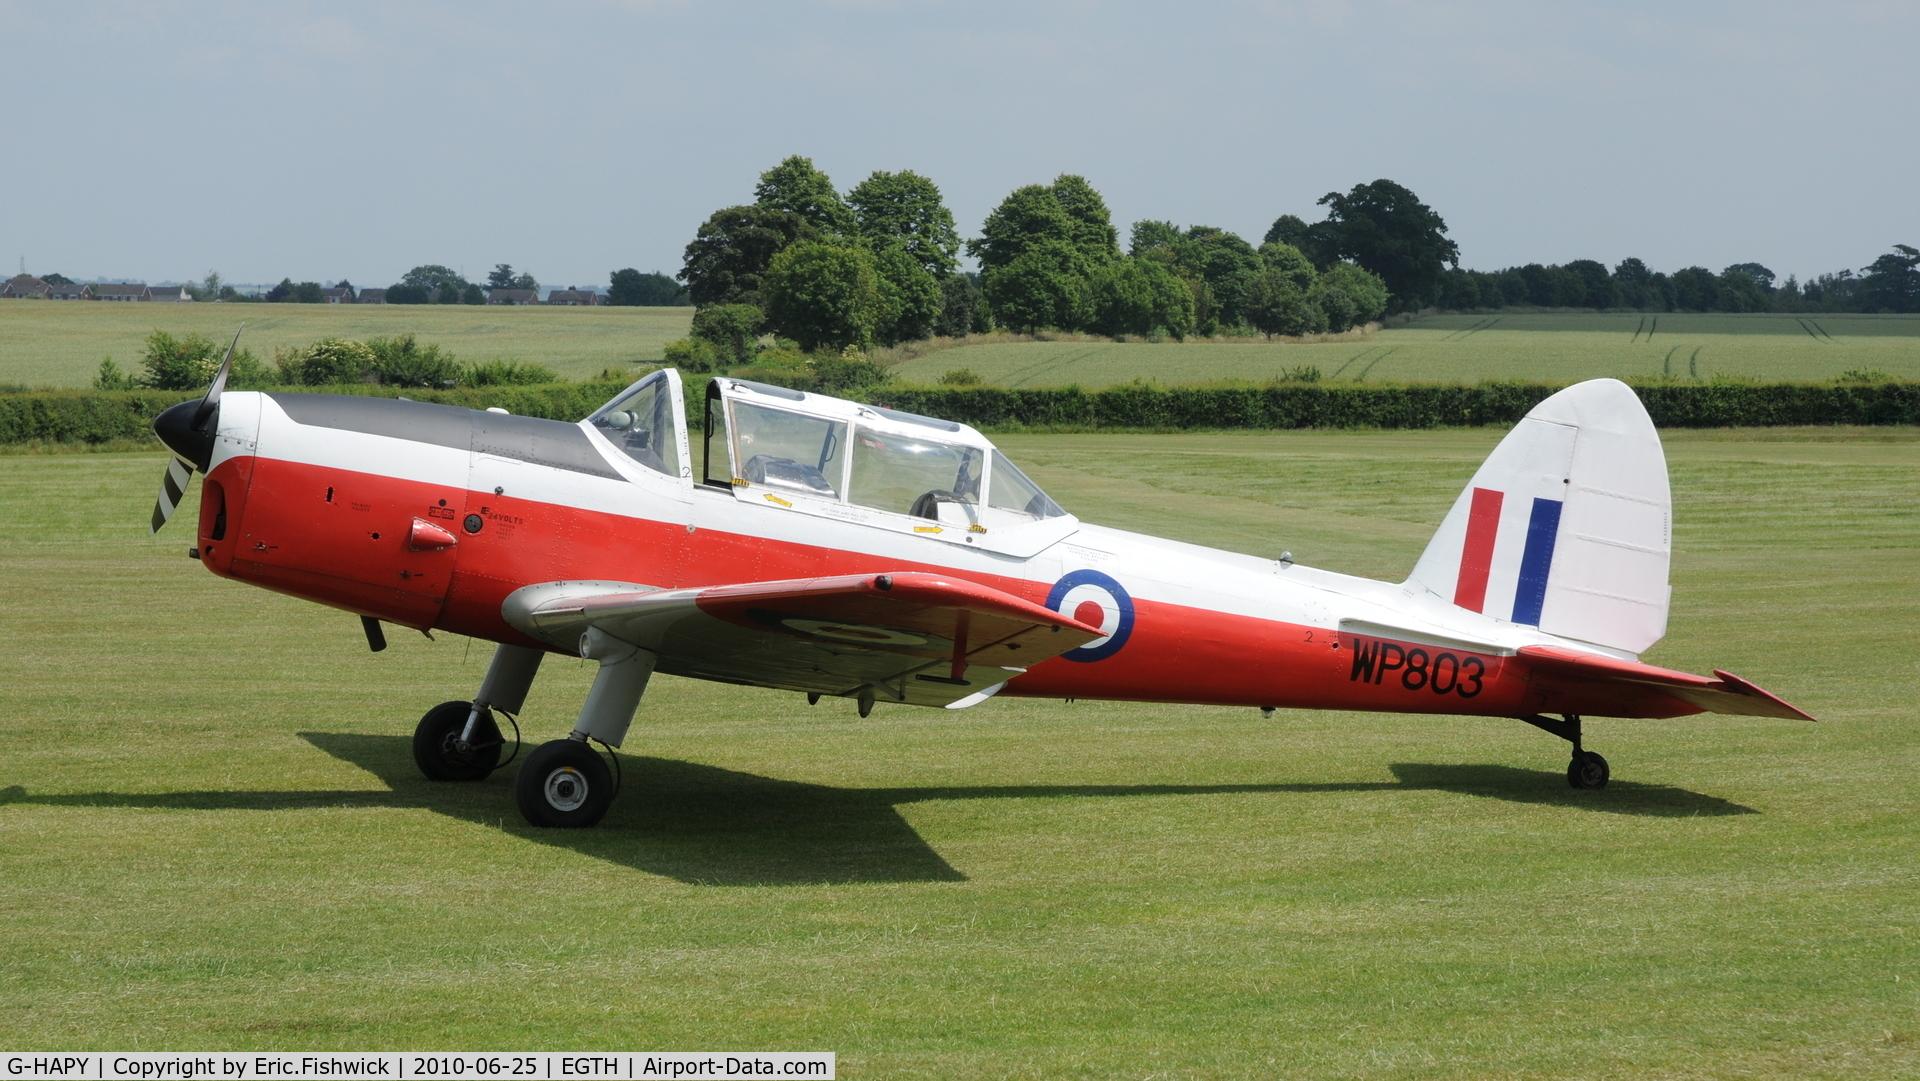 G-HAPY, 1952 De Havilland DHC-1 Chipmunk T.10 C/N C1/0697, WP803 visiting Shuttleworth (Old Warden) Airfield